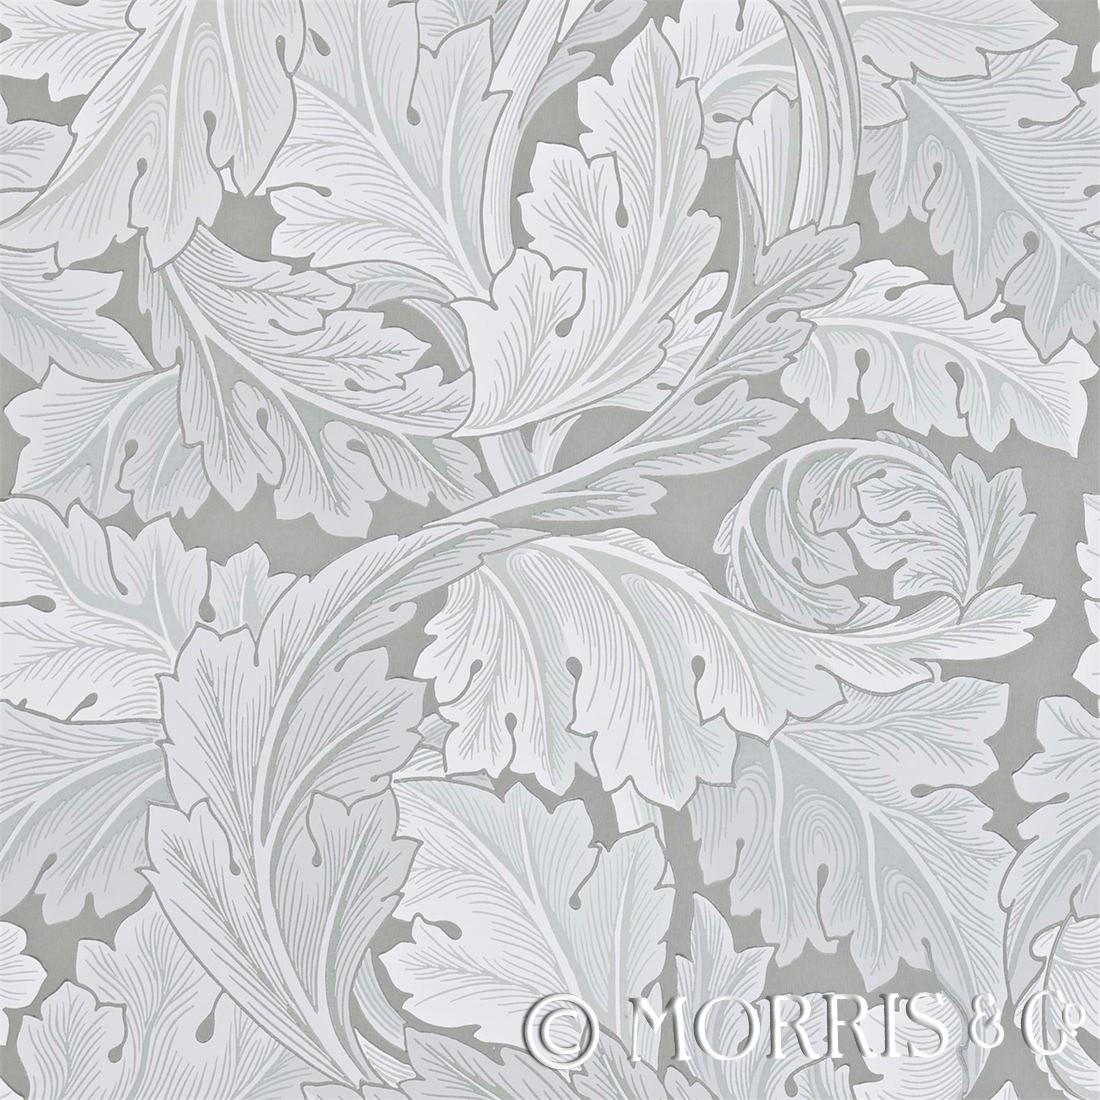 Morris & Co Tapet Acanthus marble